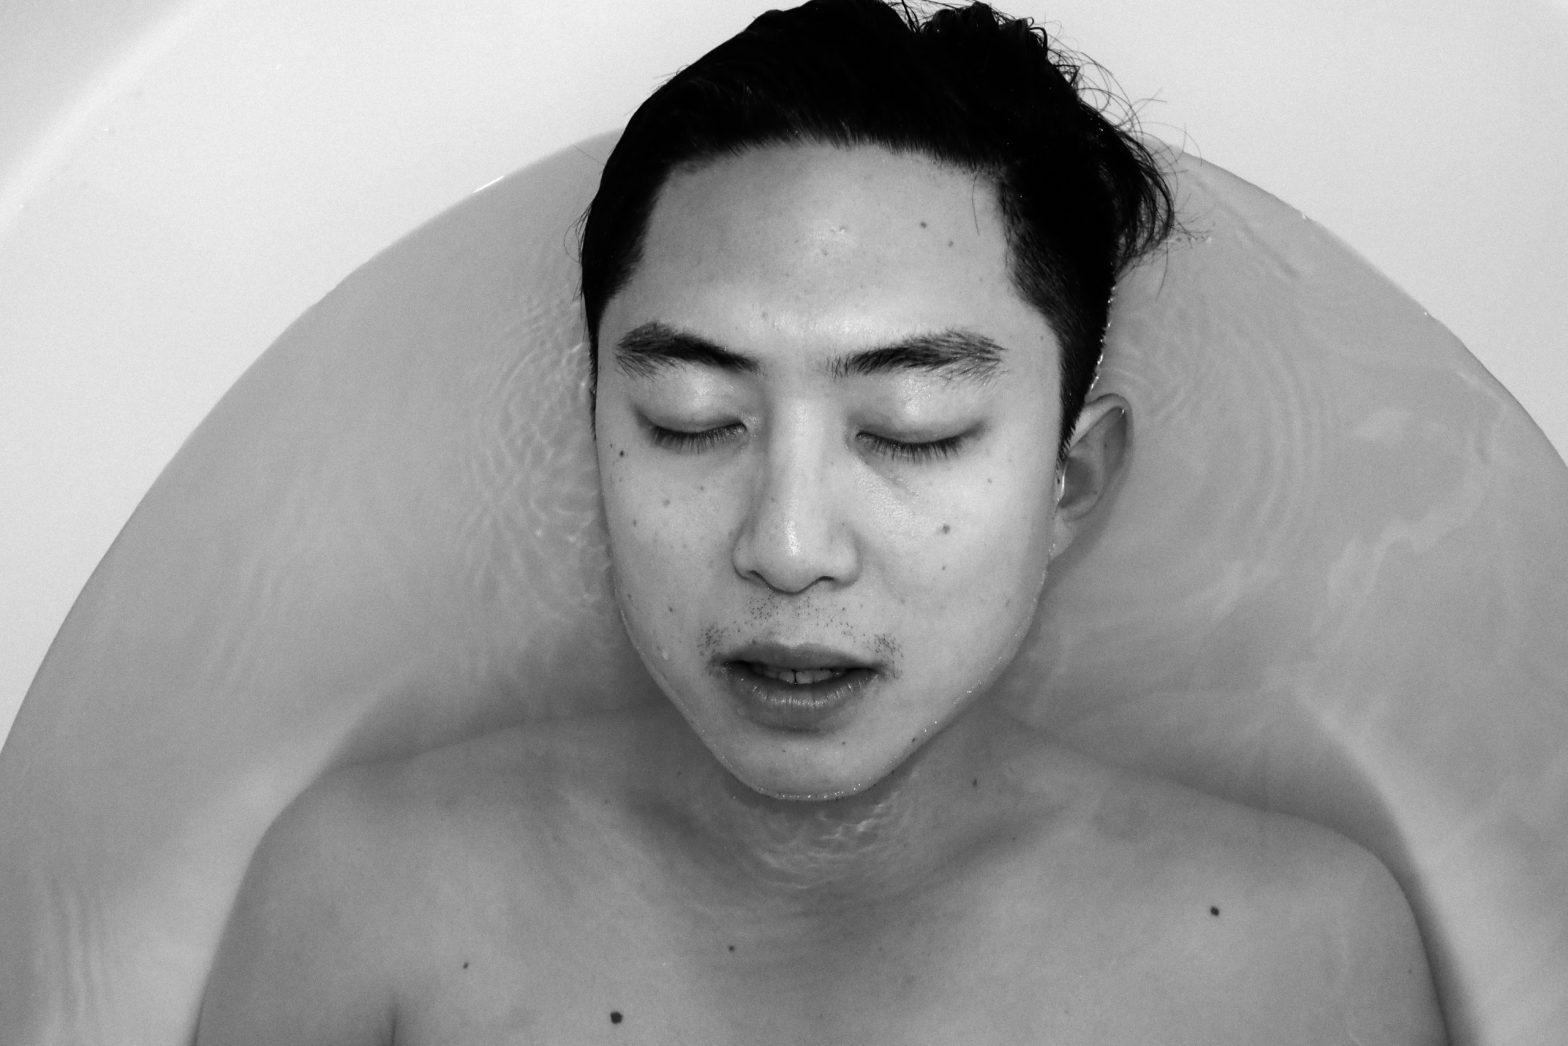 selfie ERIC KIM memento mori bath tub